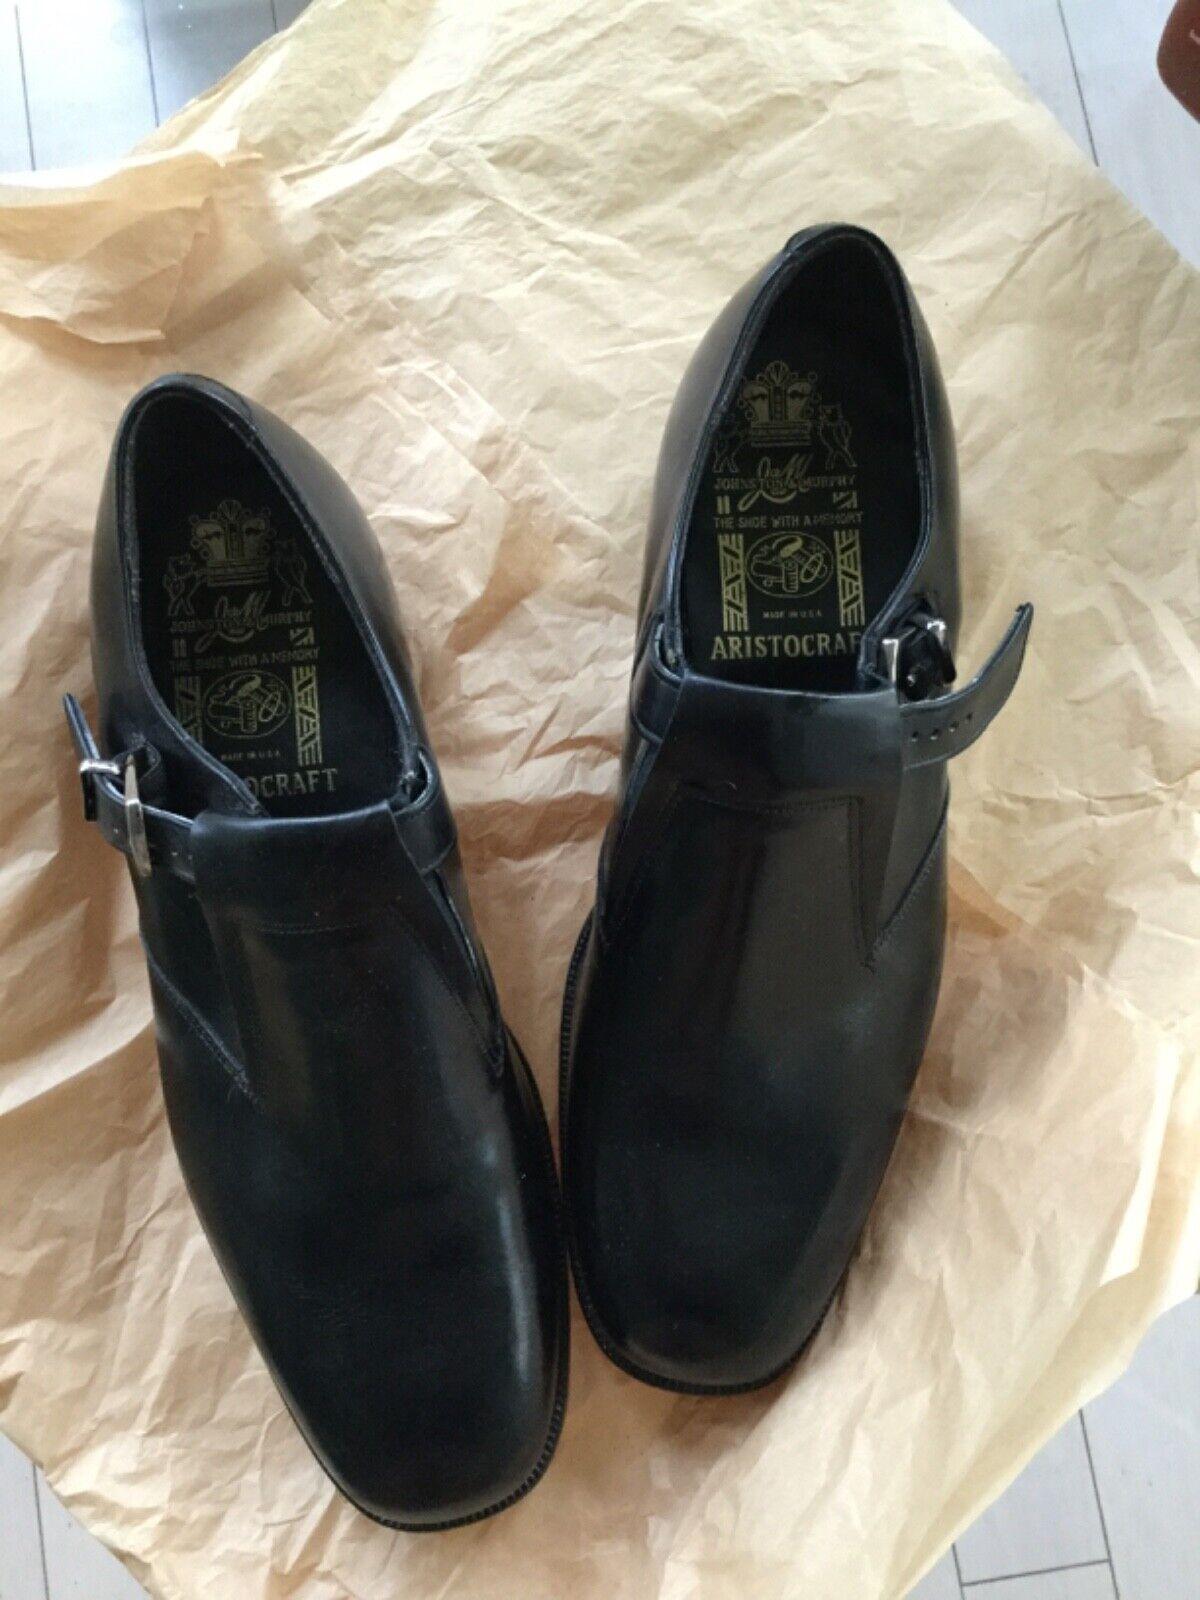 NEW Vintage Johnson & Murphy Aristocrat Black Leather Strap Dress Shoe - 9.5C